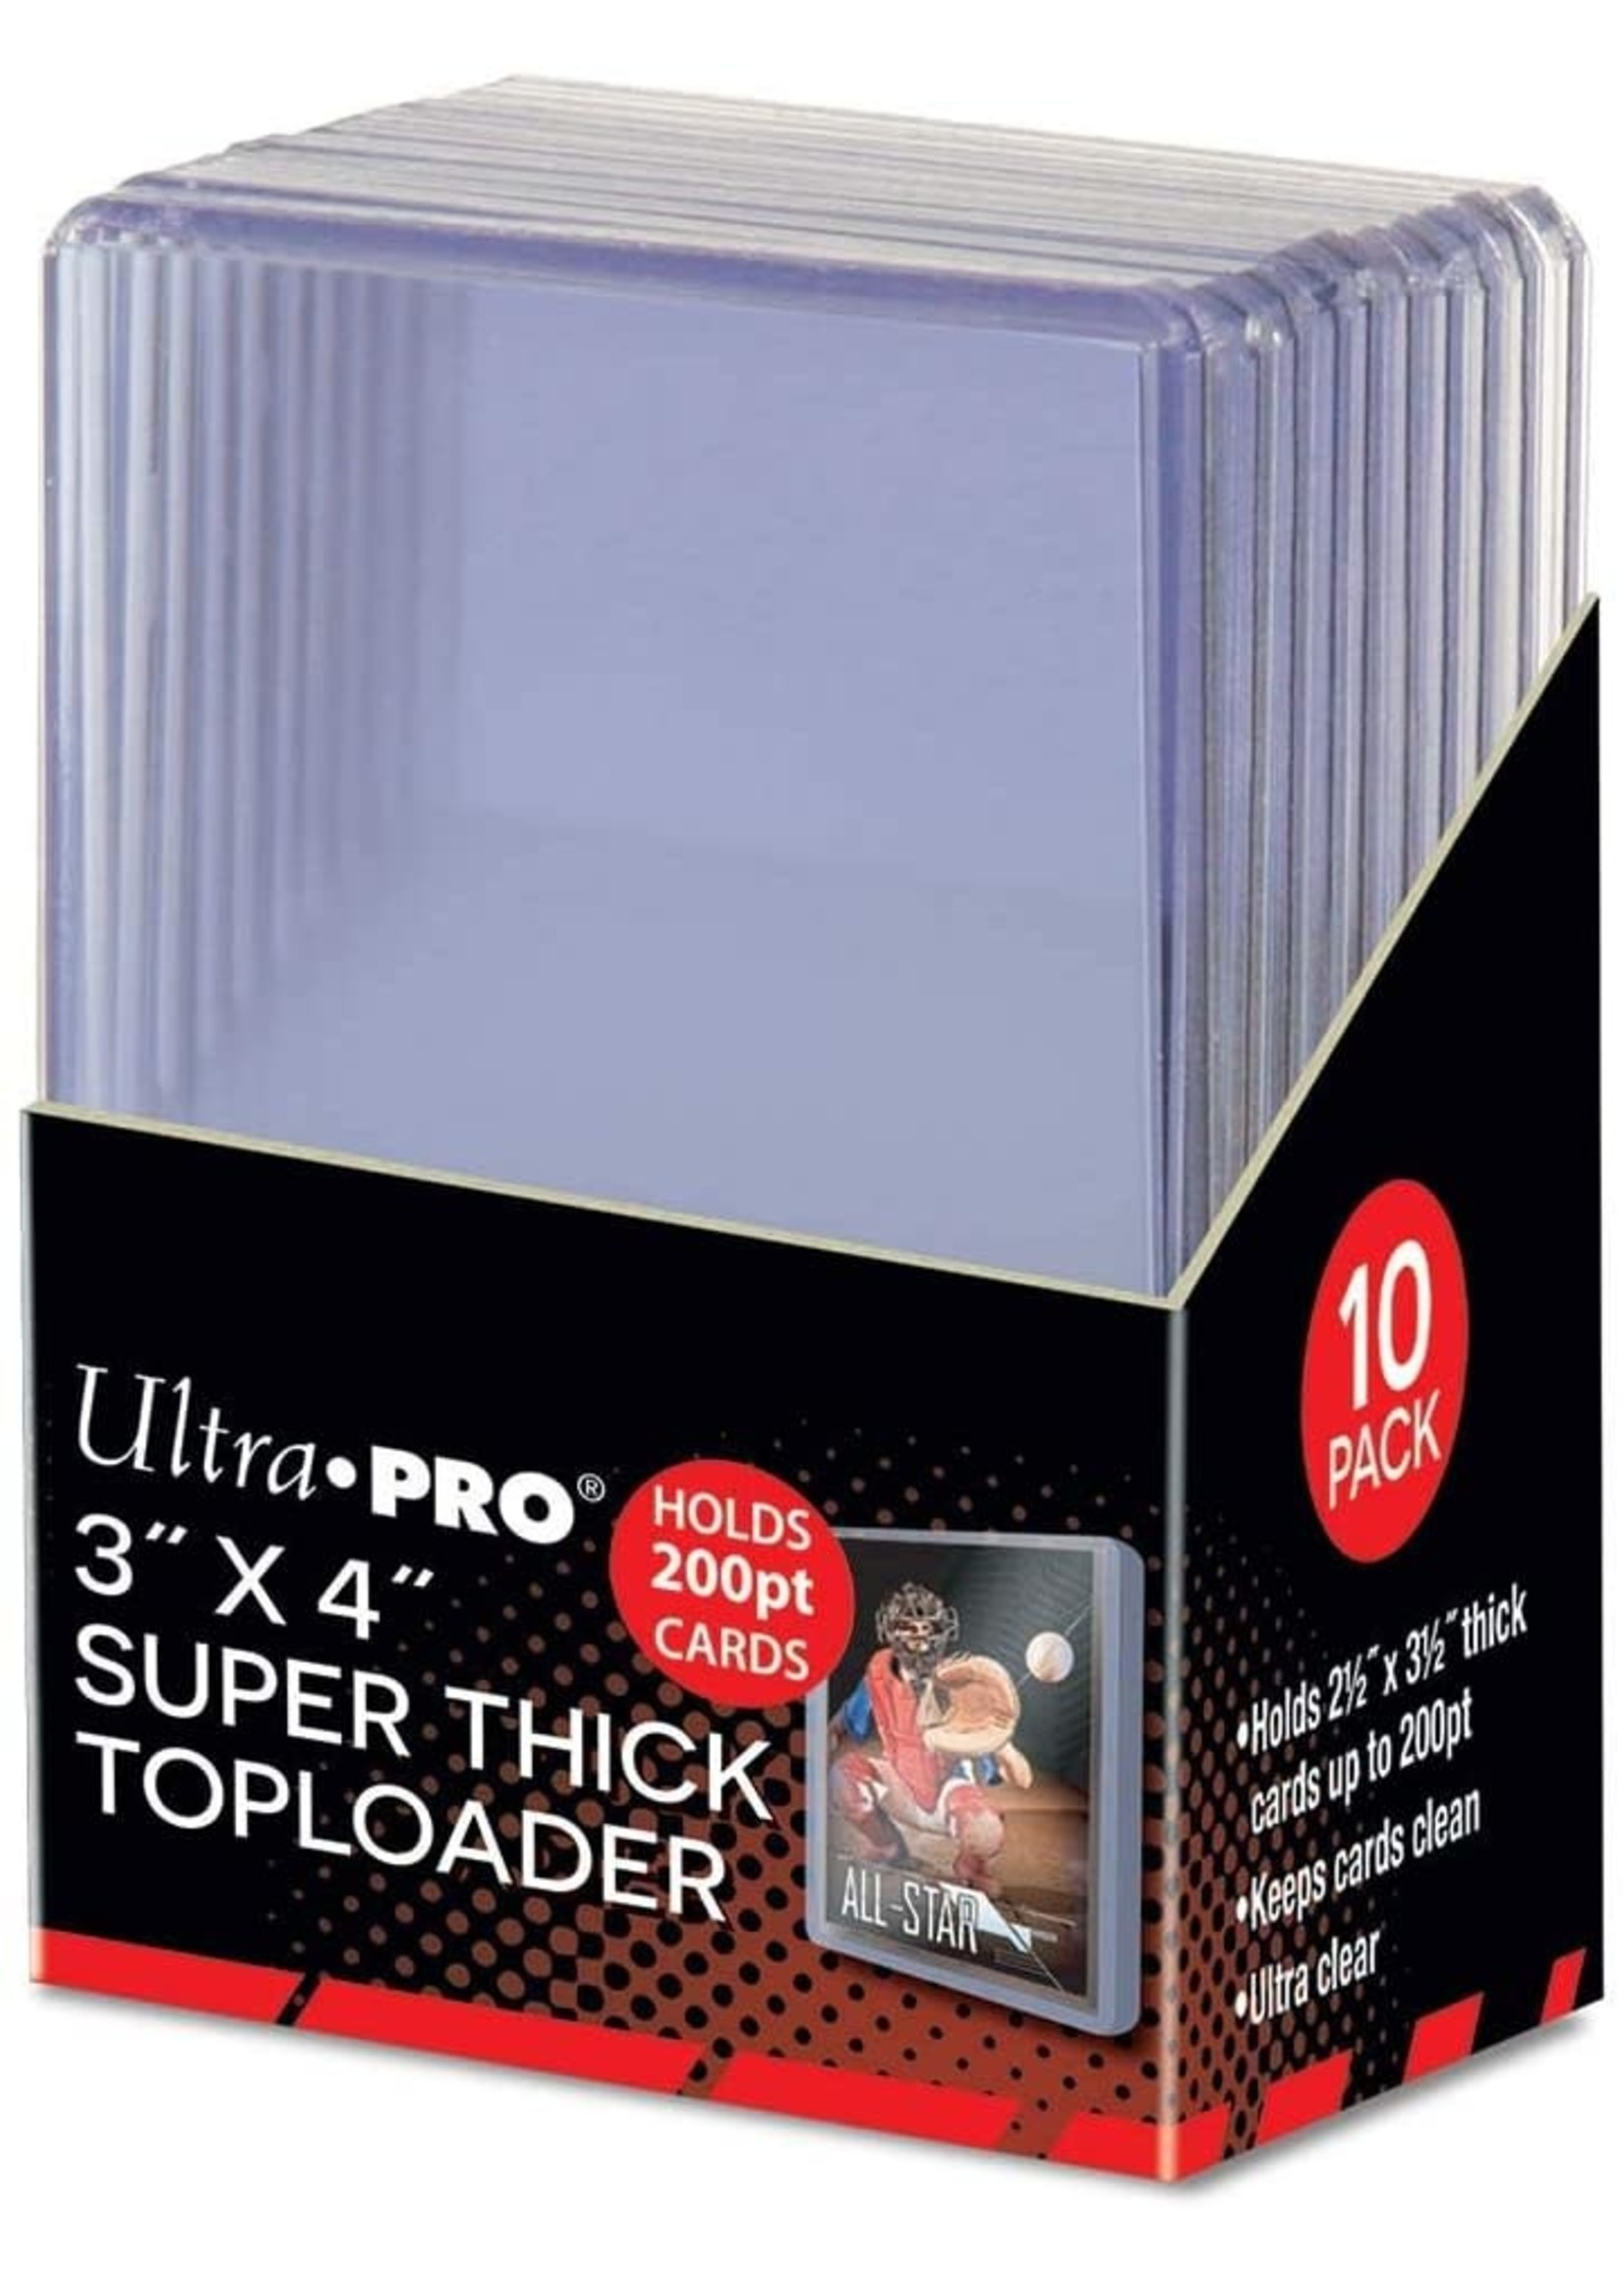 Ultra Pro Ultra Pro Super Thick Toploader  200pt